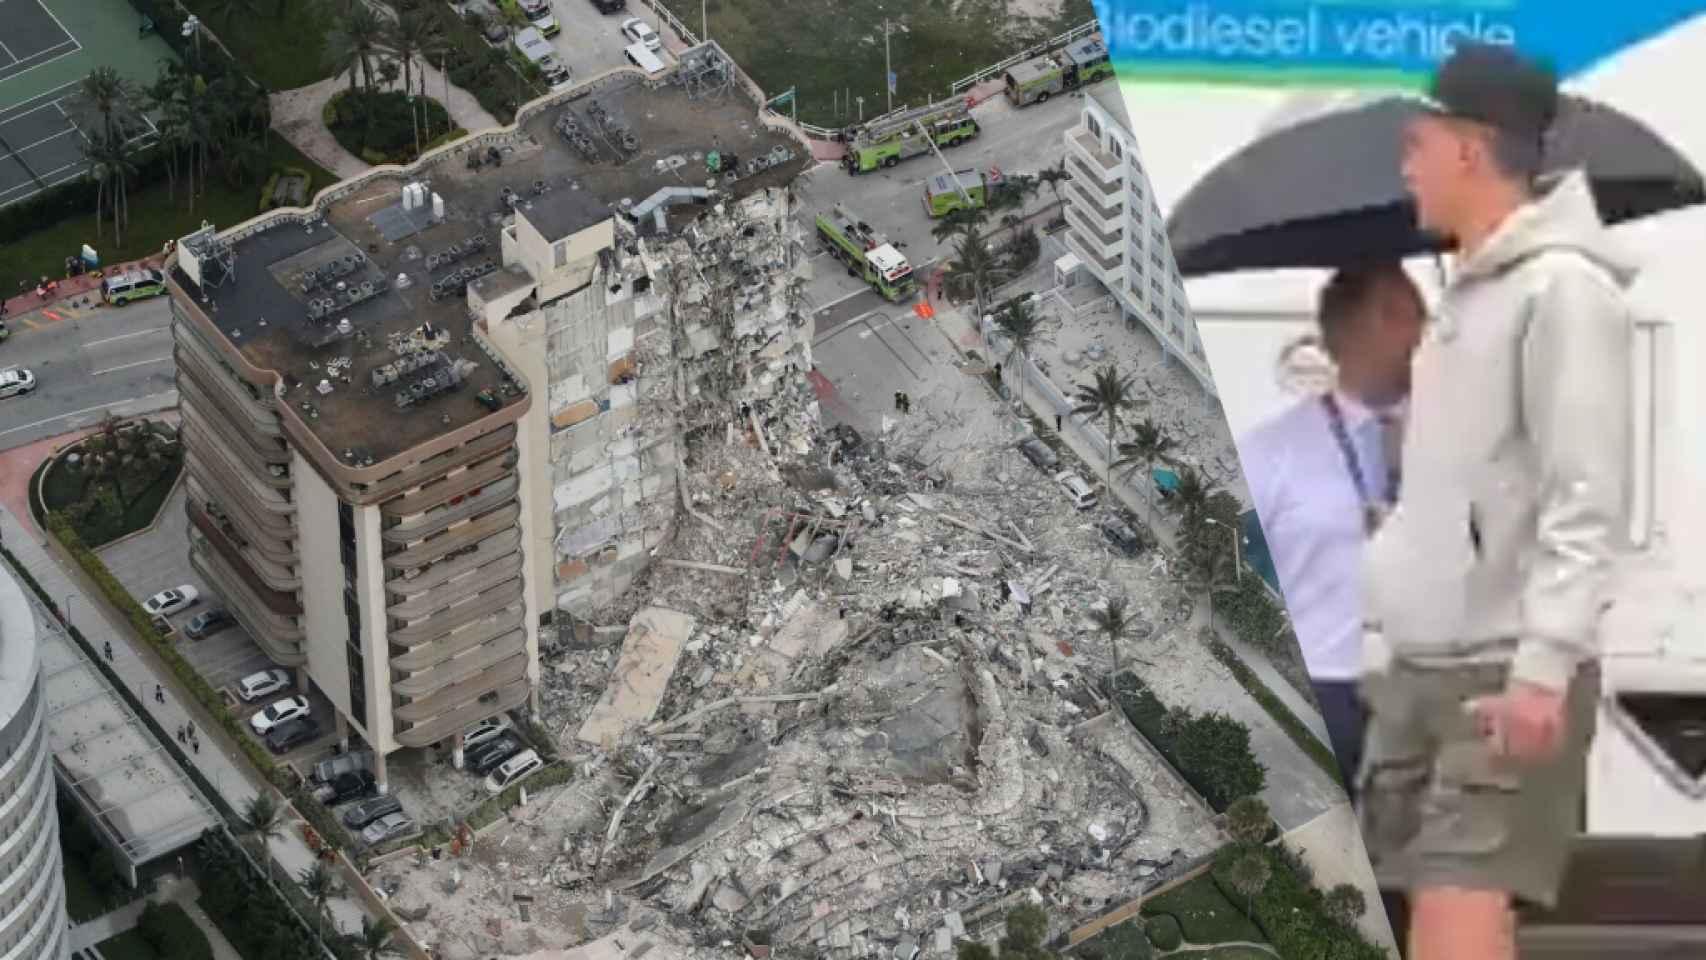 Tyler Herro, en el derrumbe en Miami